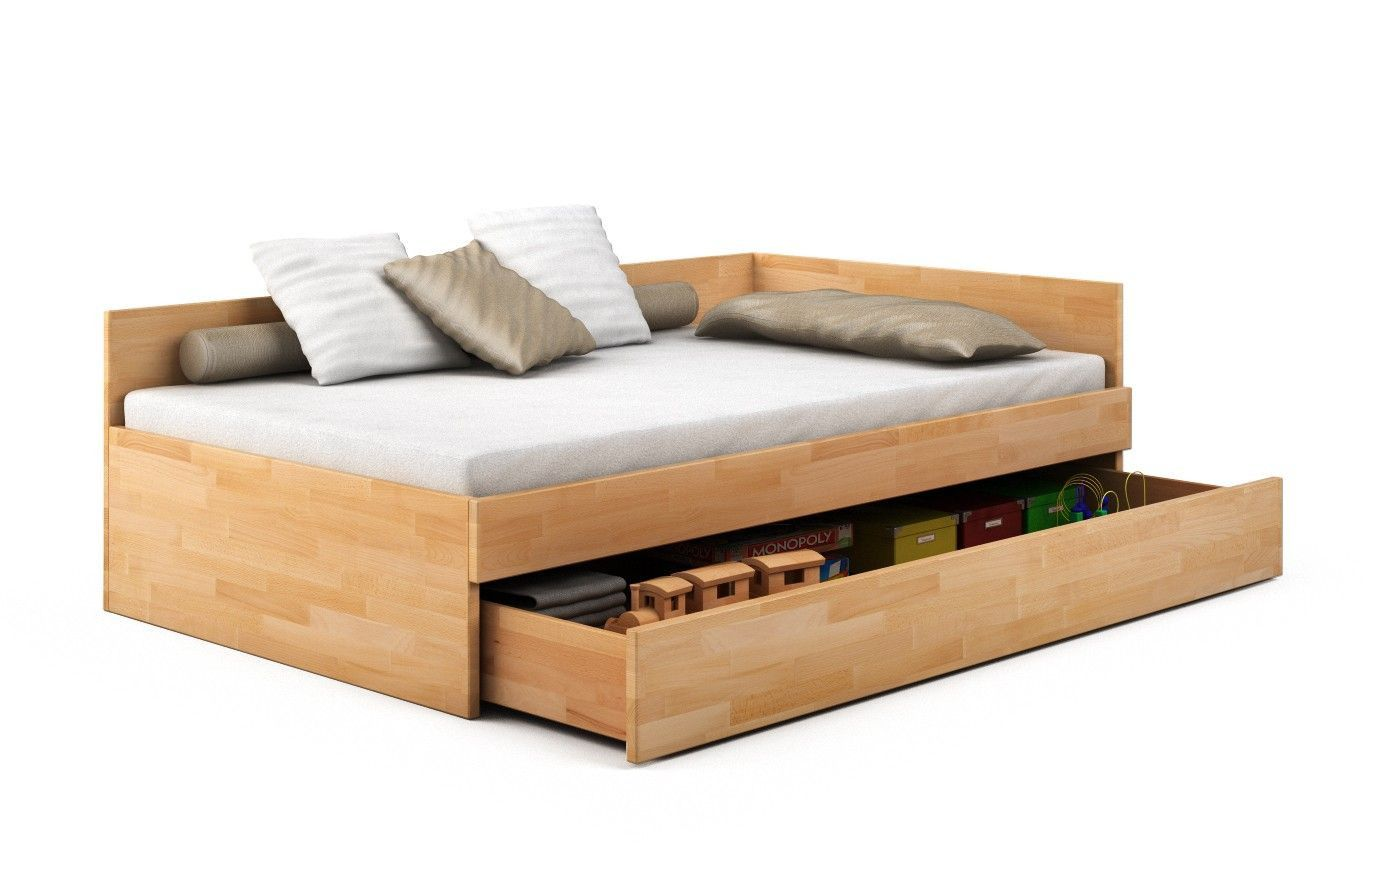 Bett 120 200 Holz Best Of Bett Buche Tigre Massivholz Pv 120 X 200